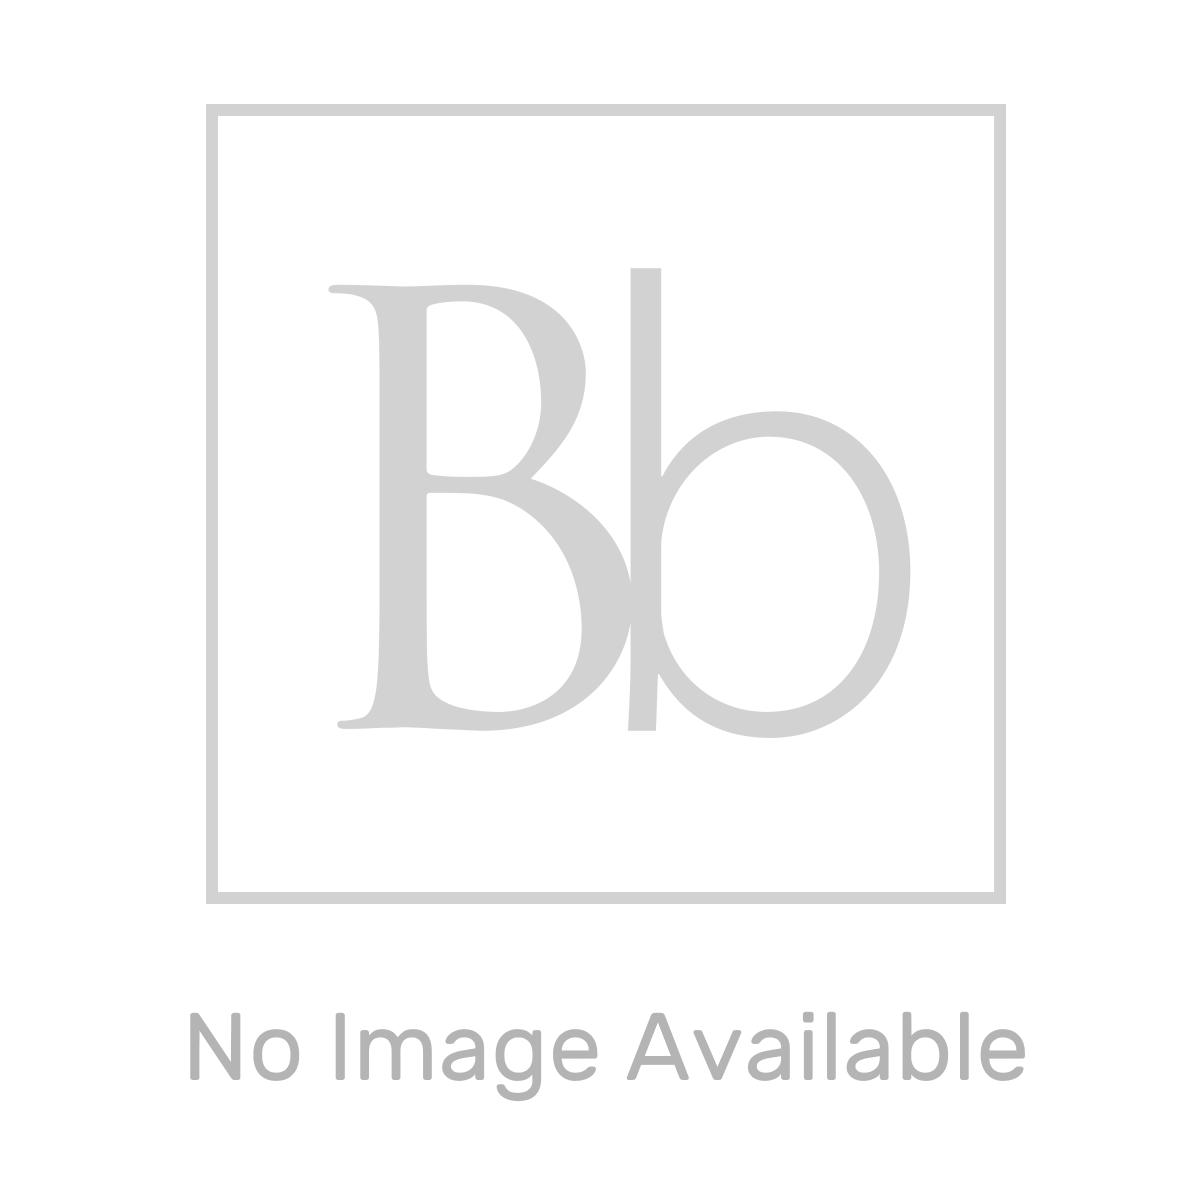 RAK Feeling Black Rectangular Shower Tray 1700 x 900mm Measurements